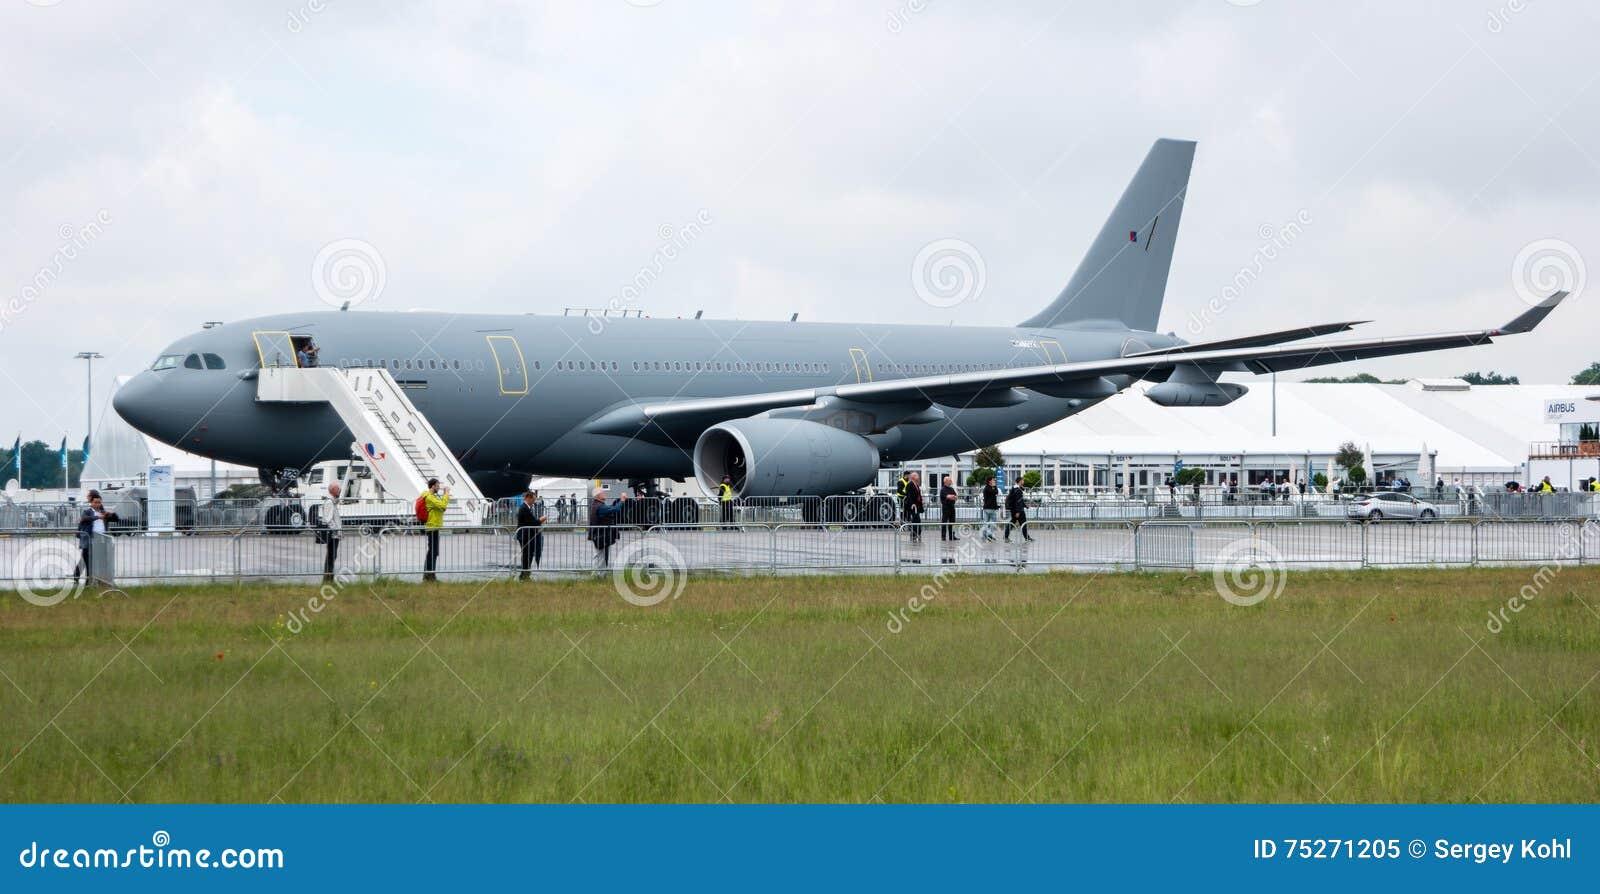 The Medical Aircraft Airbus A310-304 MRTT MedEvac August Euler